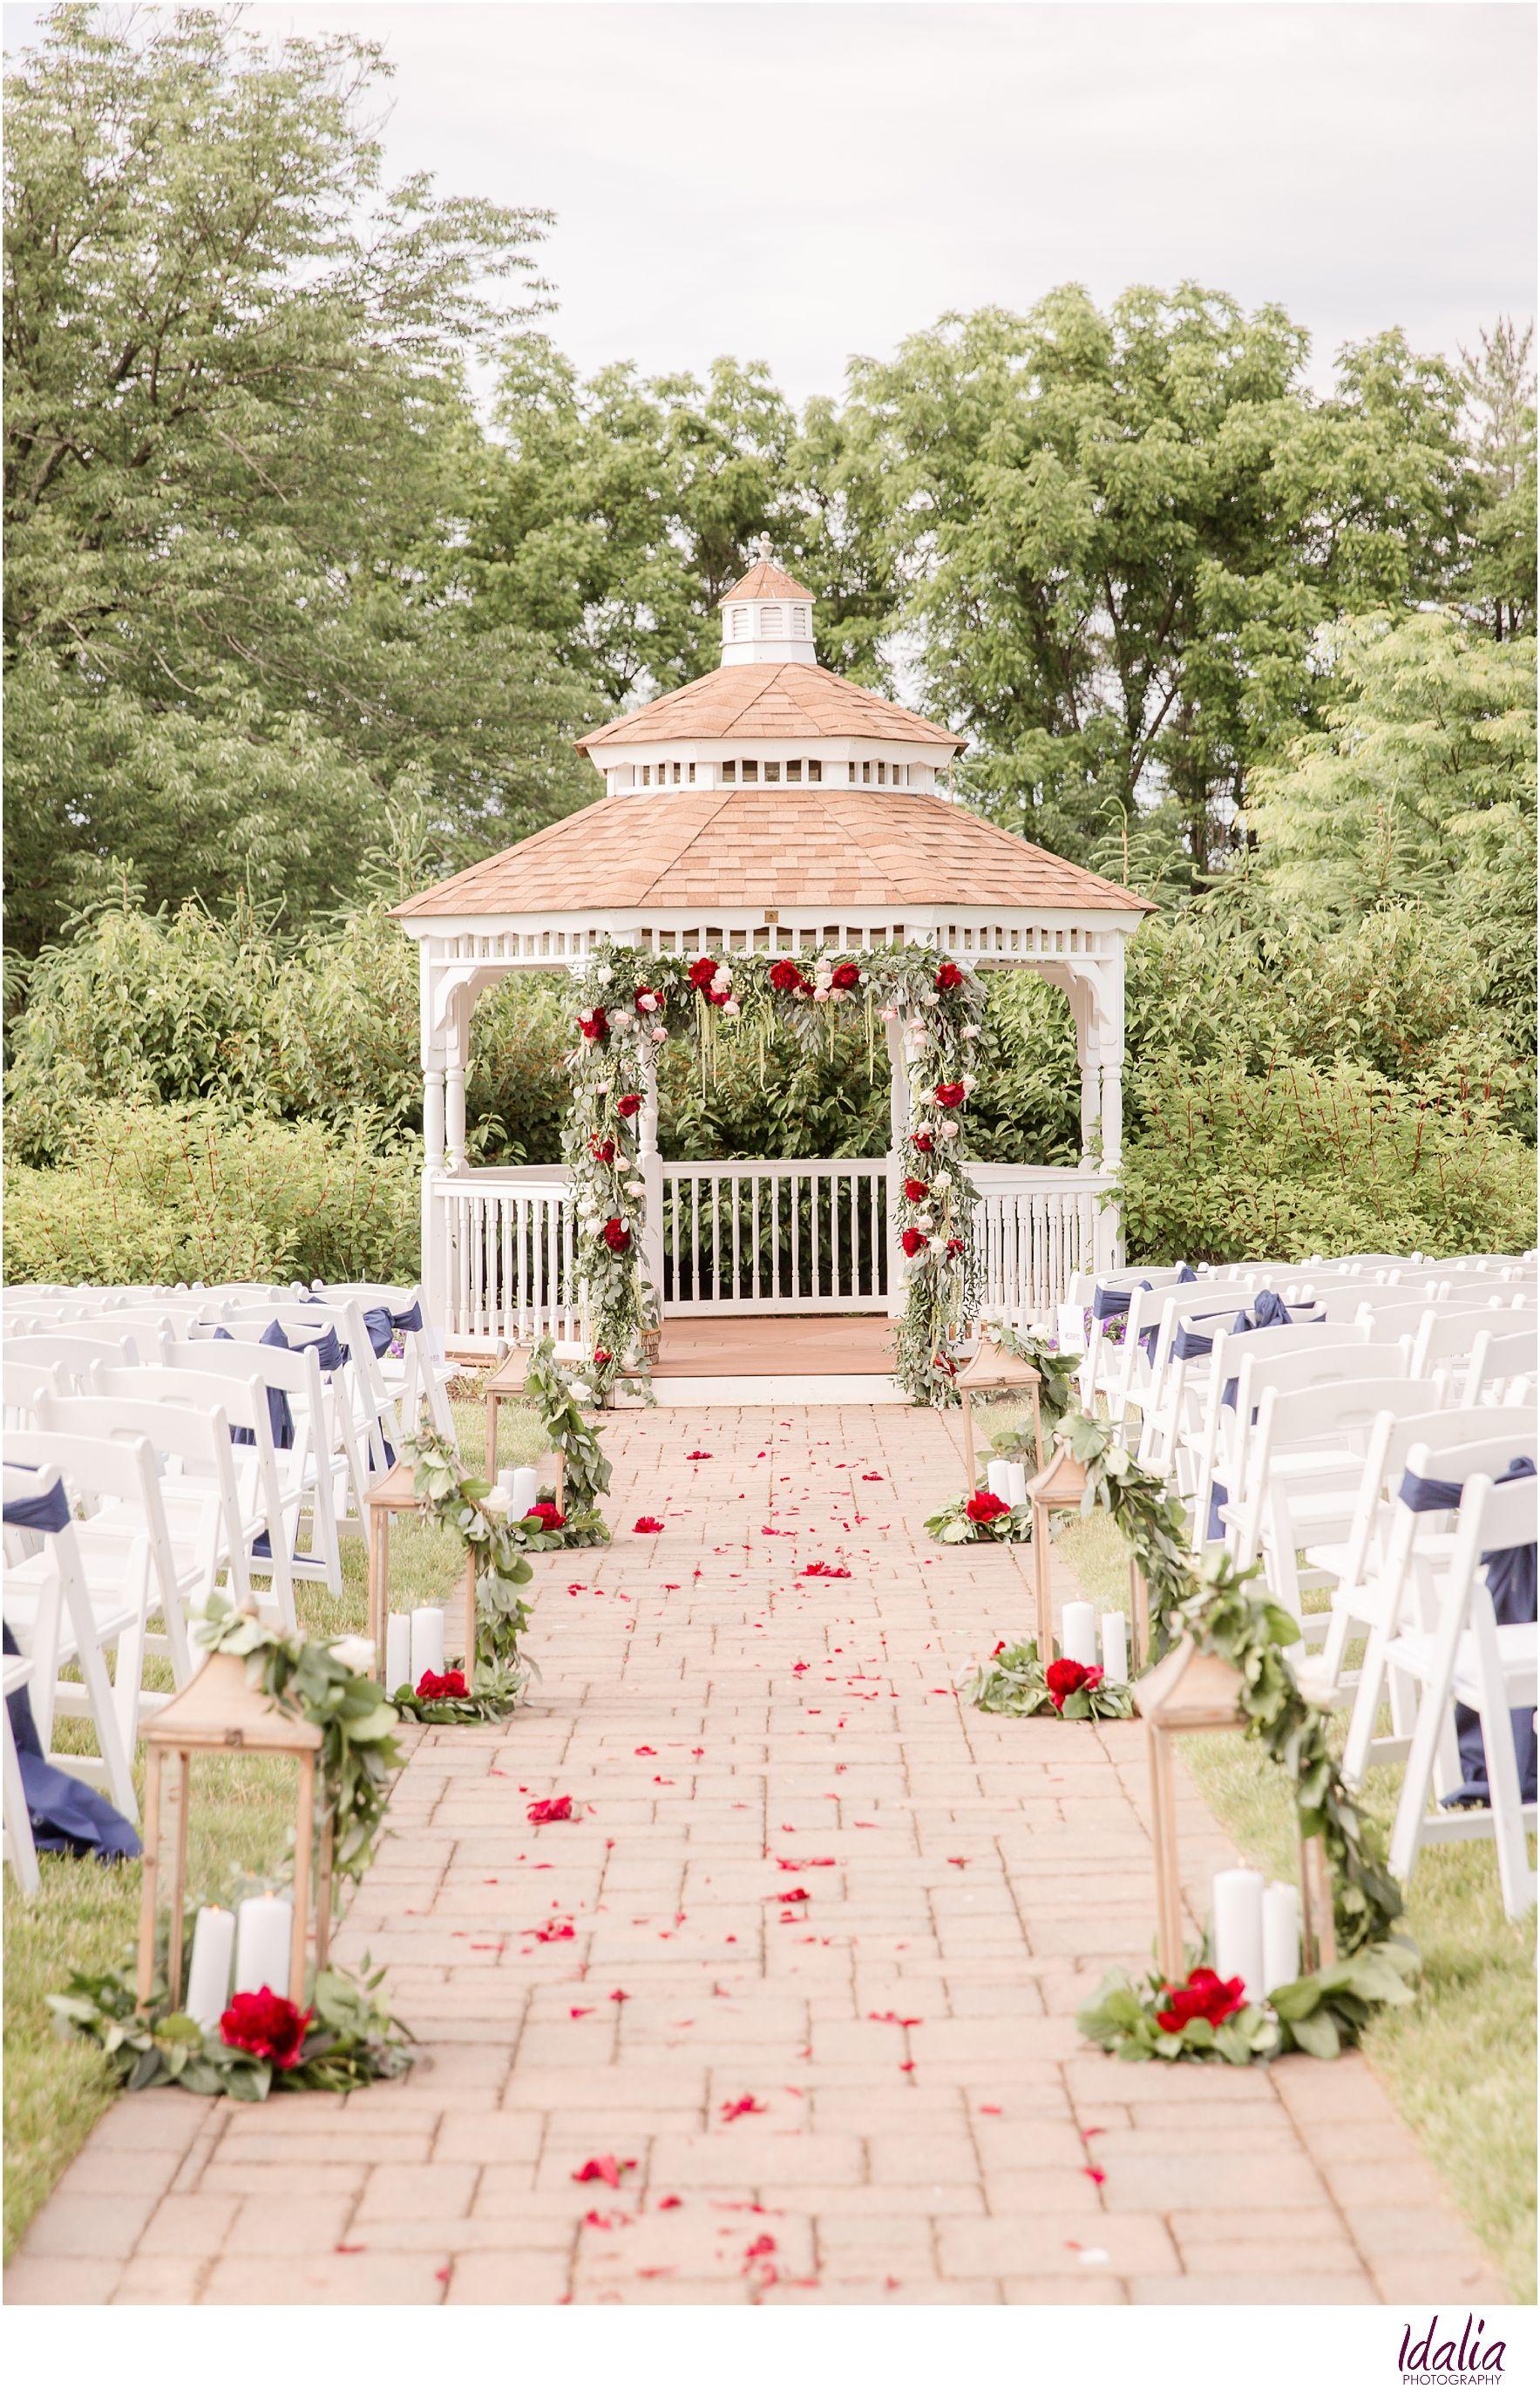 Outdoor Wedding Venues NJ (With images) | Outdoor wedding ...